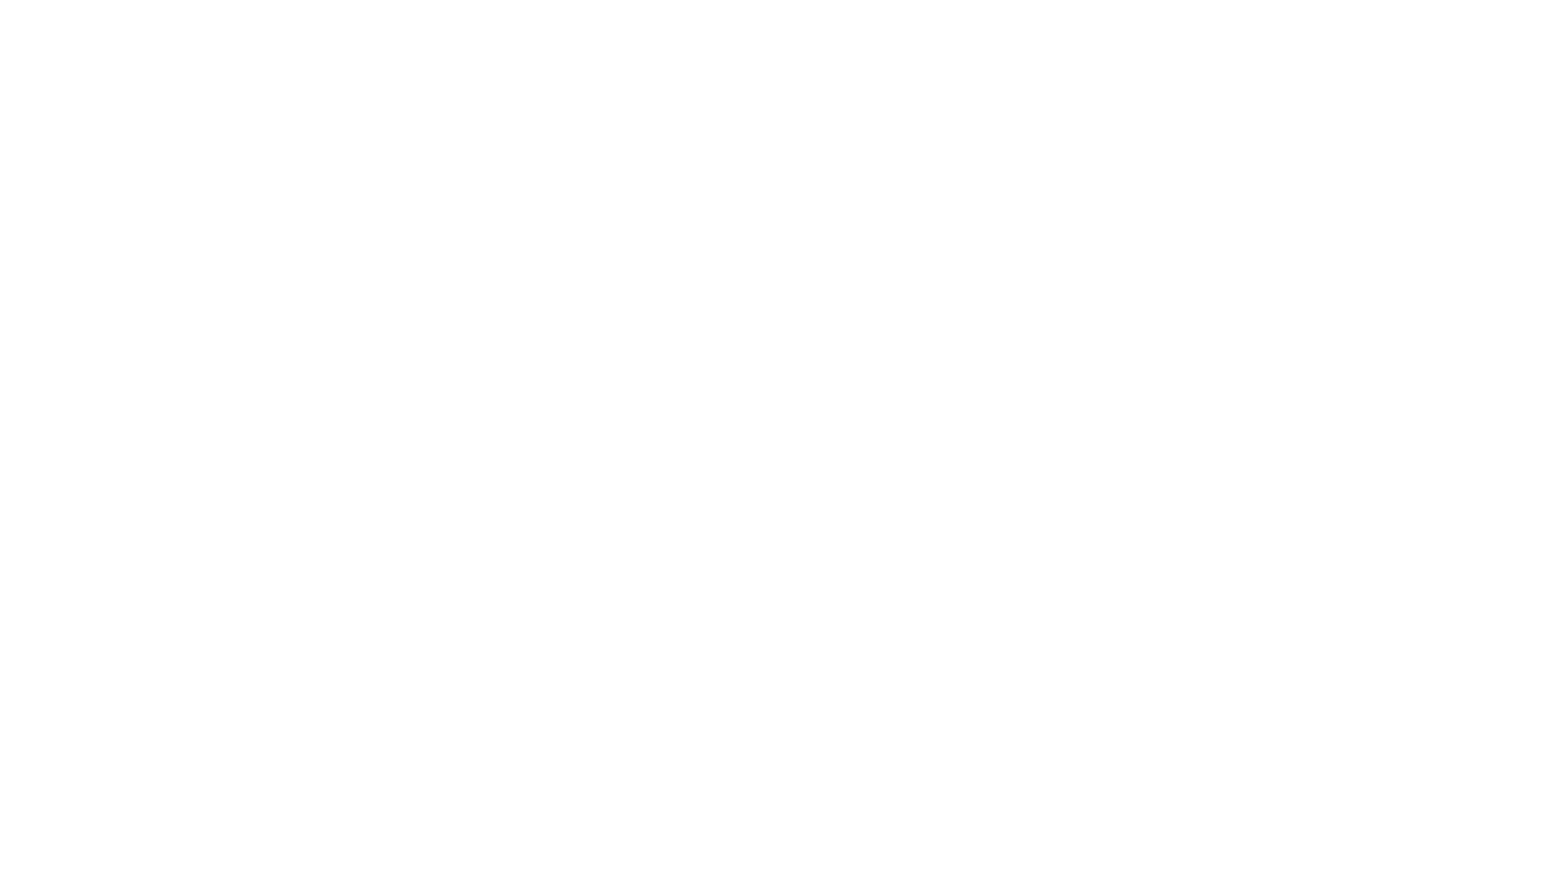 Affinio product (1)_0010_Layer 2.jpg